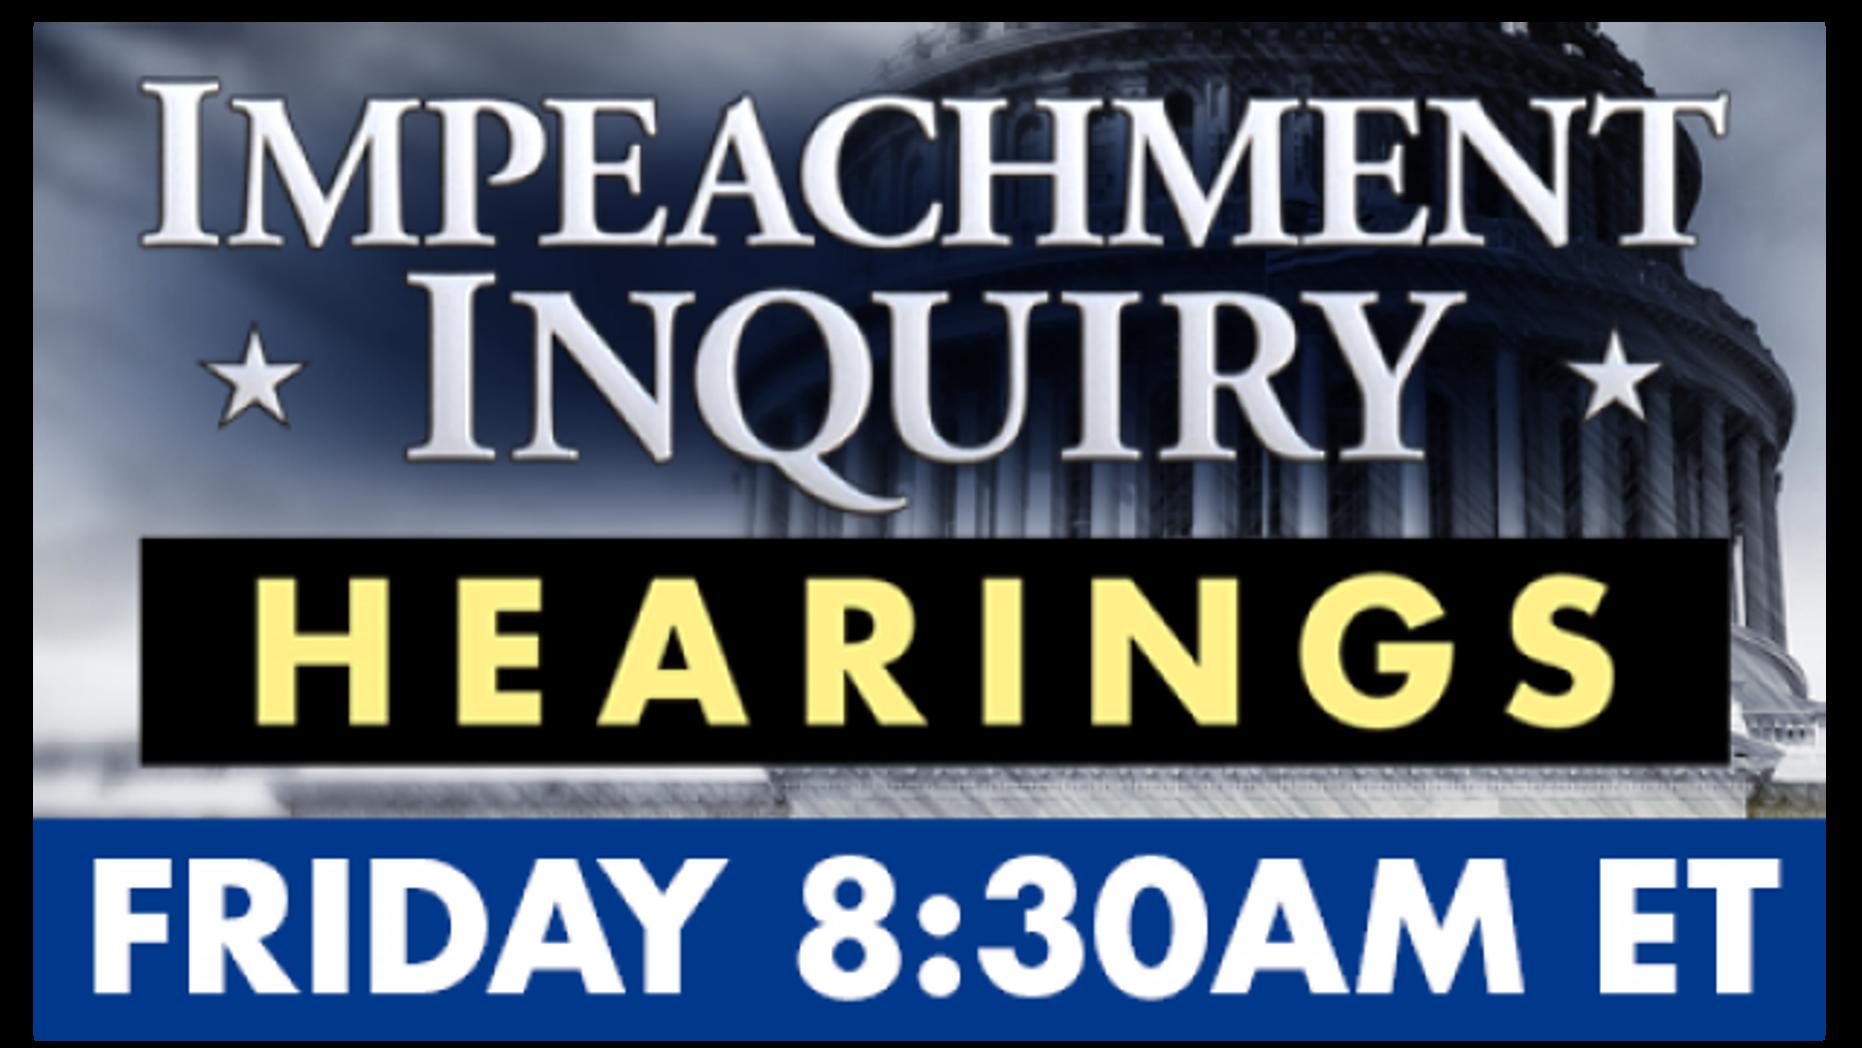 Westlake Legal Group InquiryPromo Today on Fox News, Nov. 15, 2019 fox-news/media fox-news/entertainment/media fox news fnc/media fnc article 187ac228-fe7d-5e36-9ffa-d92440ce2e40